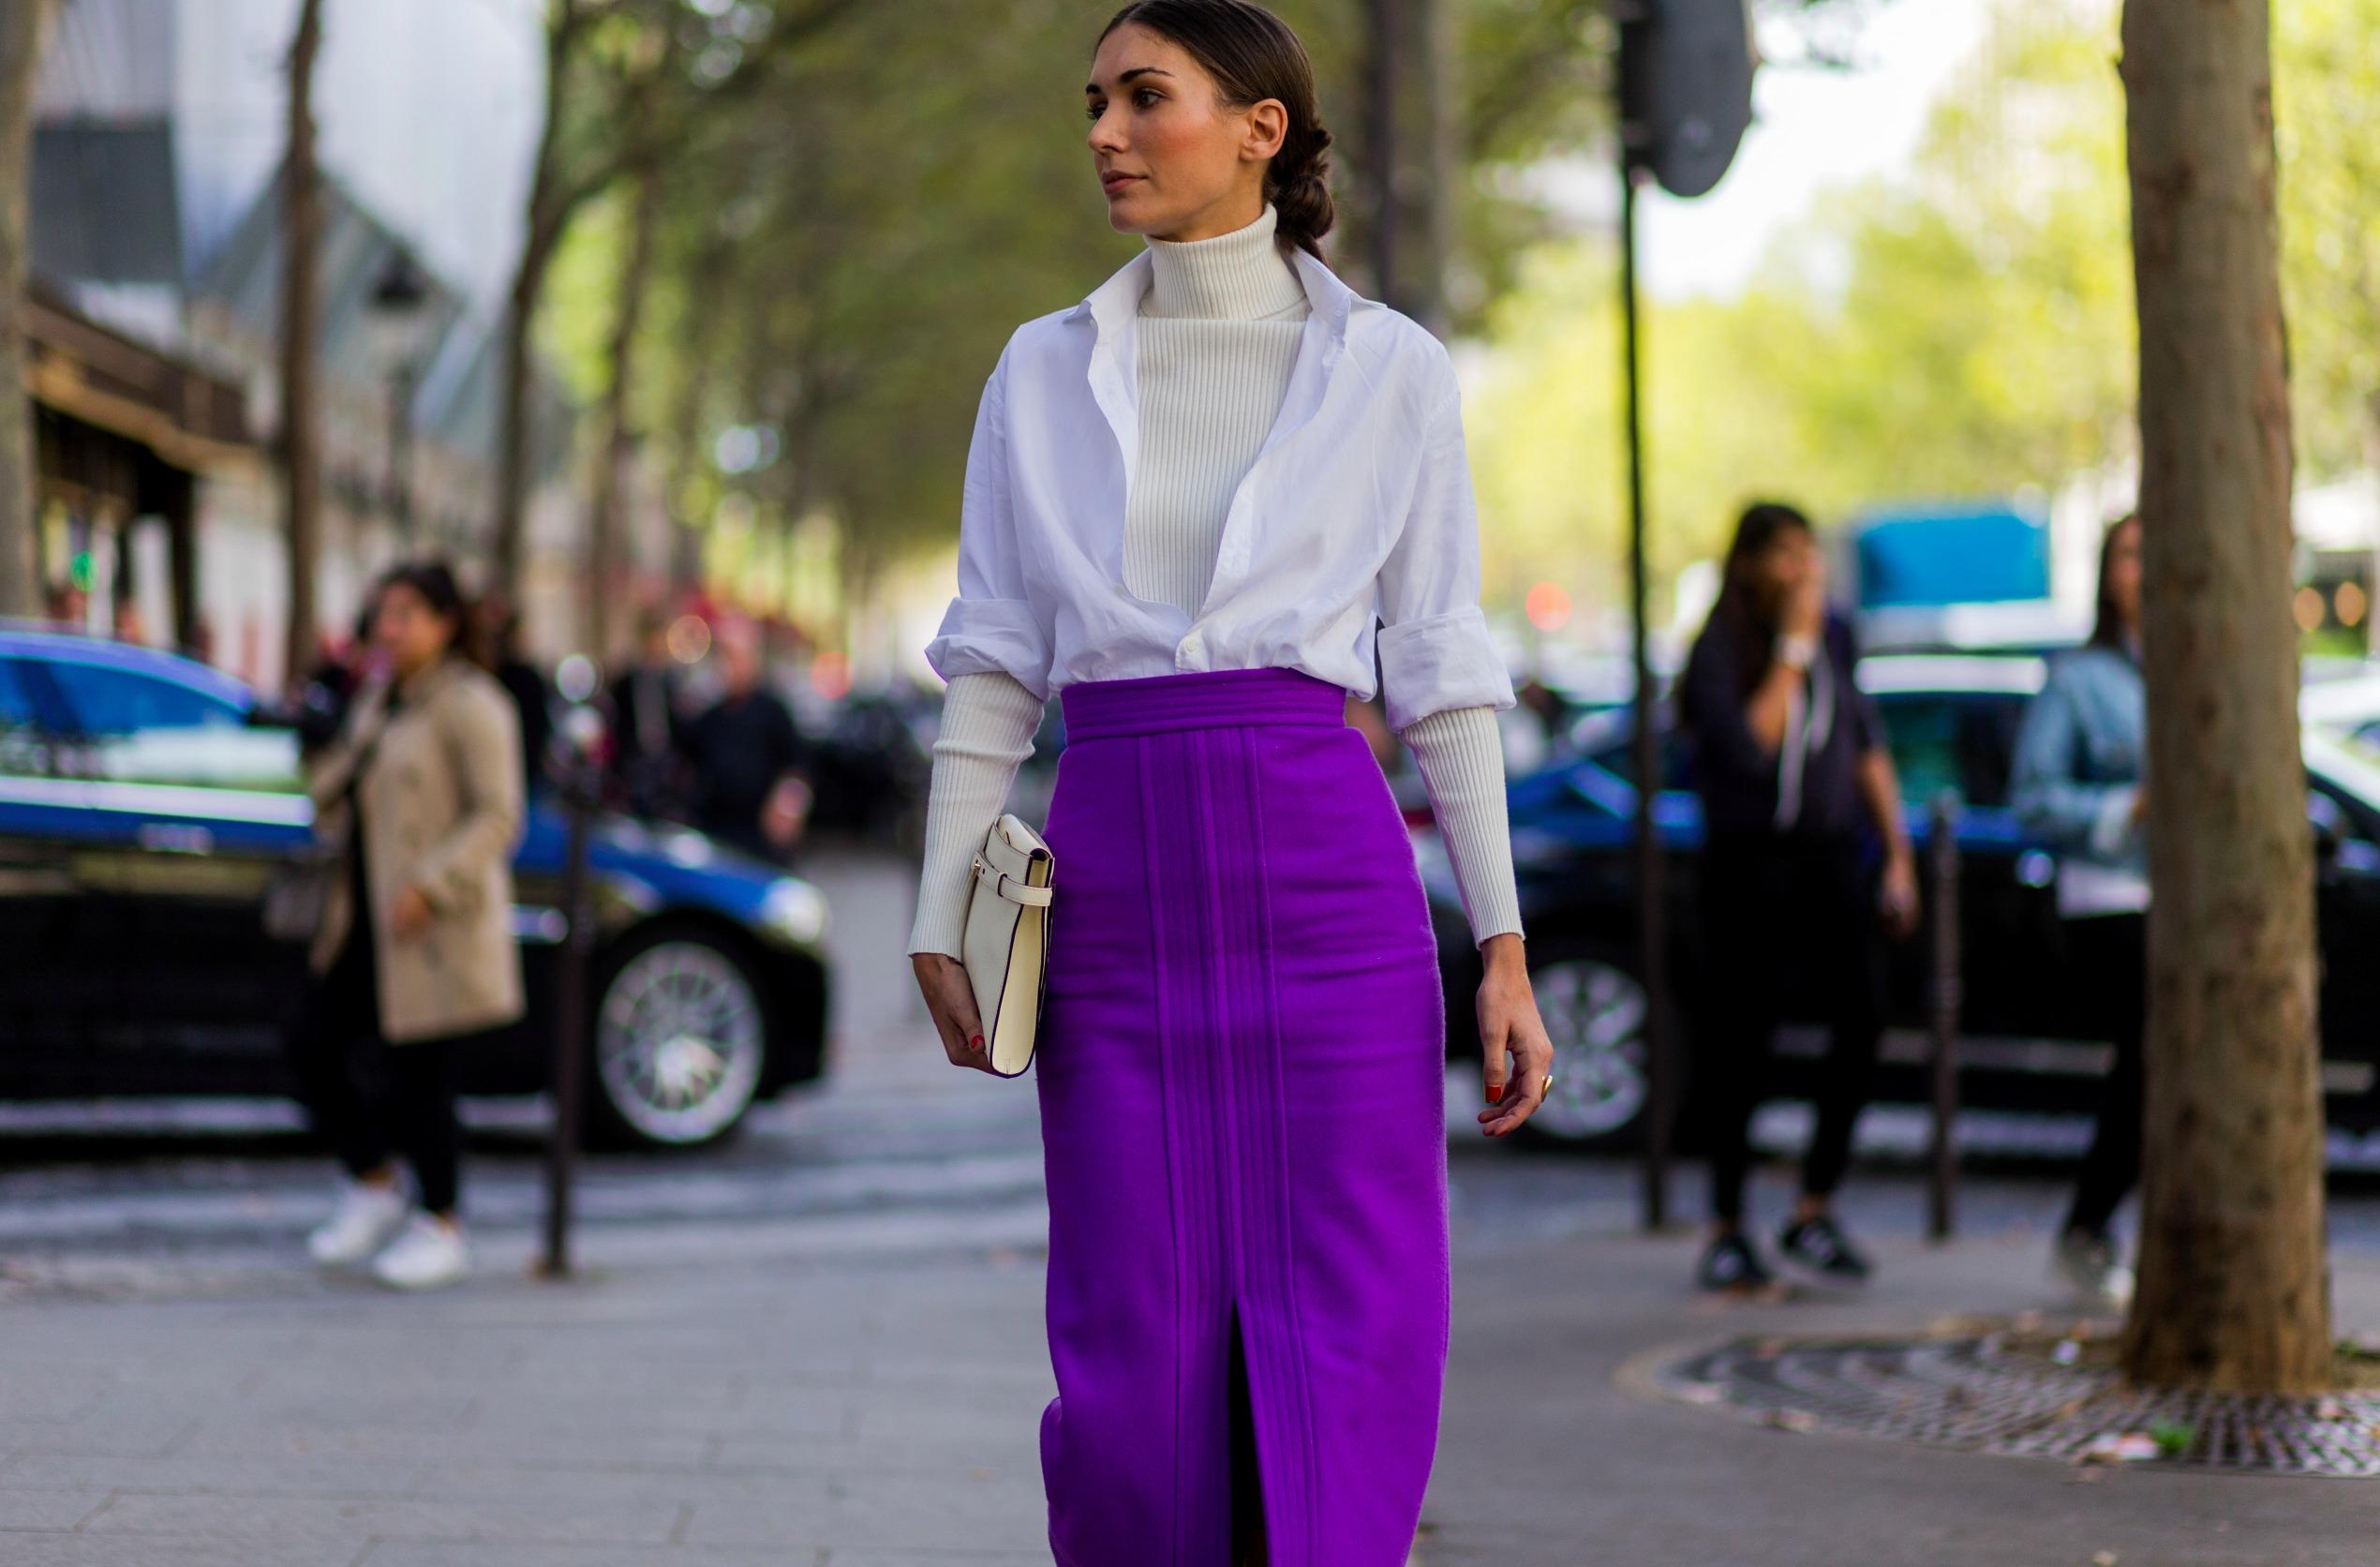 Diletta Bonaiuti - street style